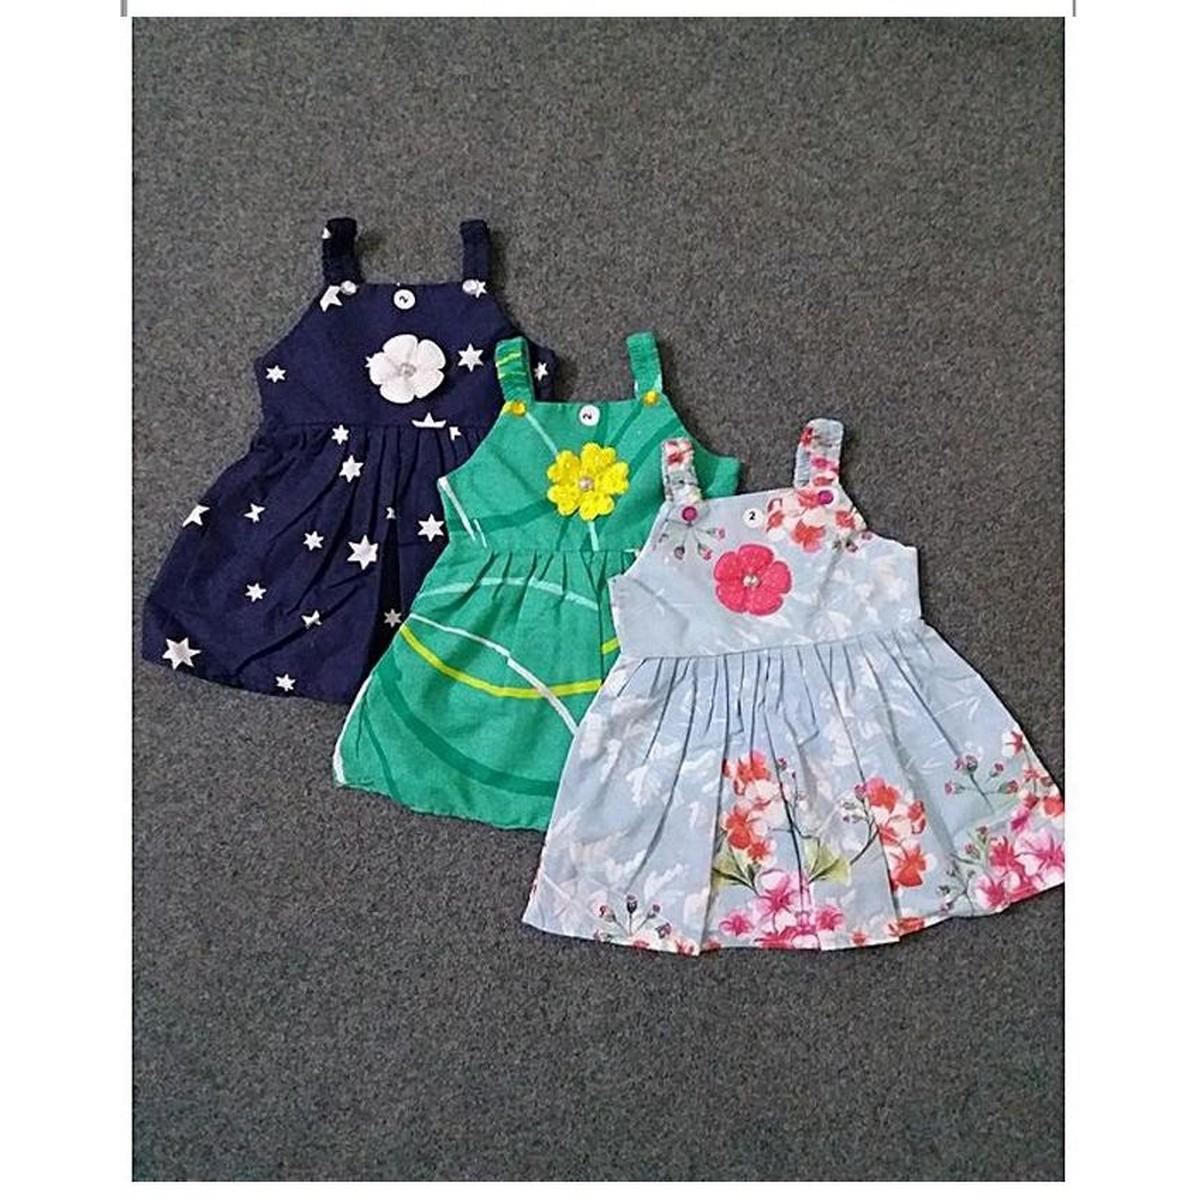 Pack Of 3 Multi-Color Printed Cotton Frock For Girls (Random Design)